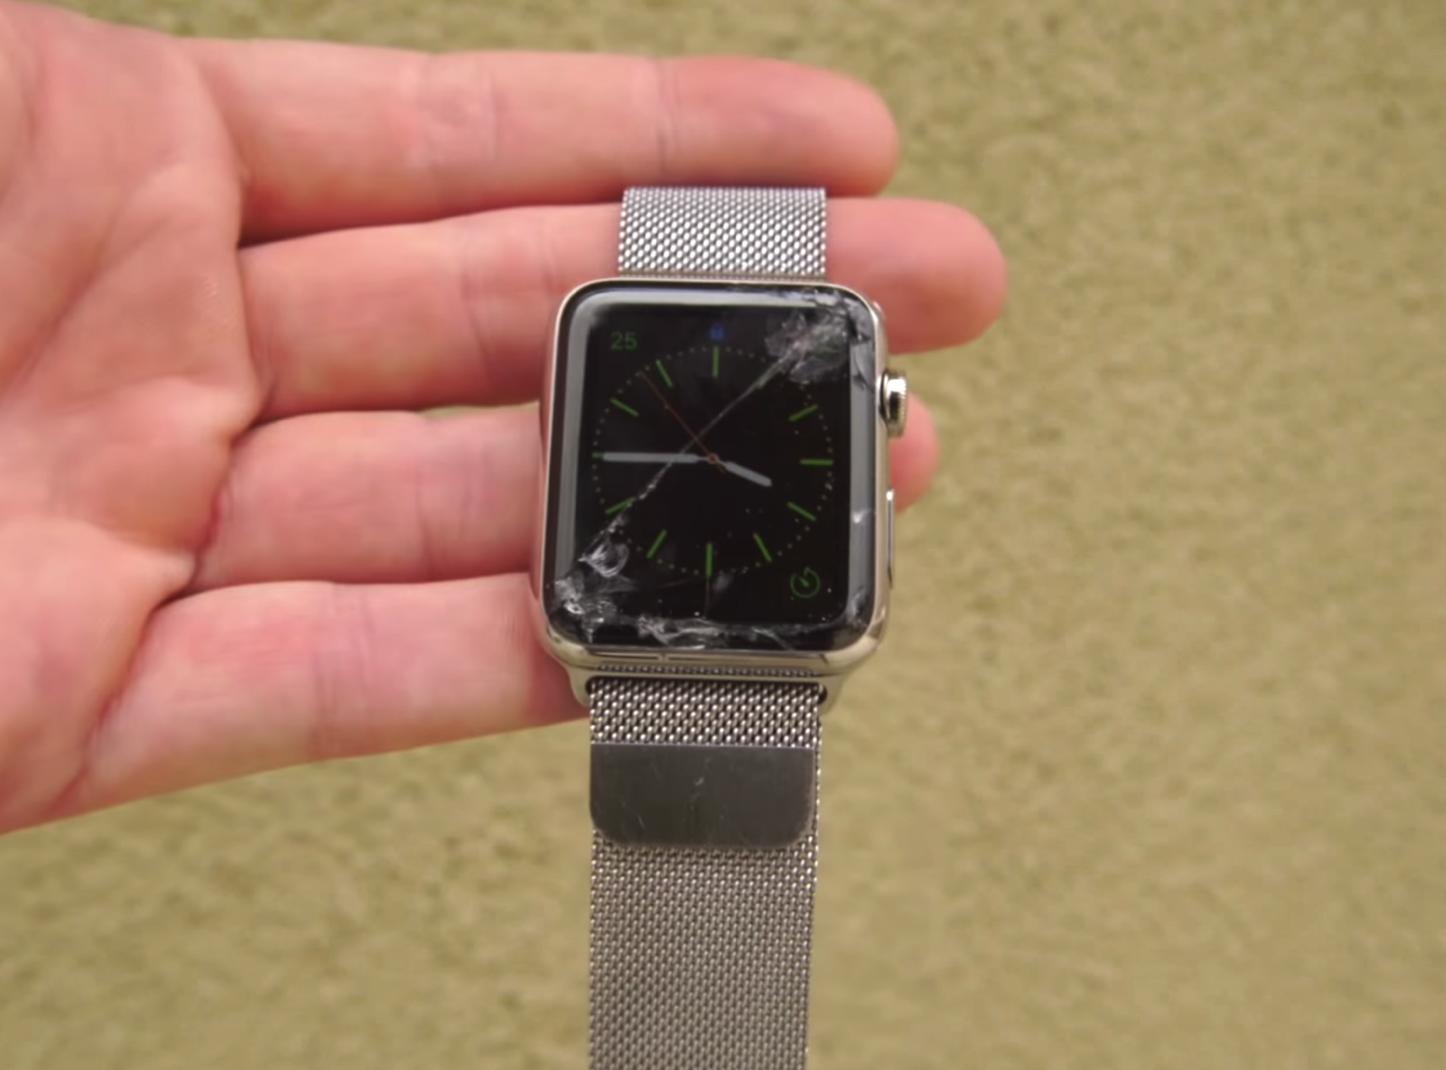 Apple-Watch-Display-Crack-1.png